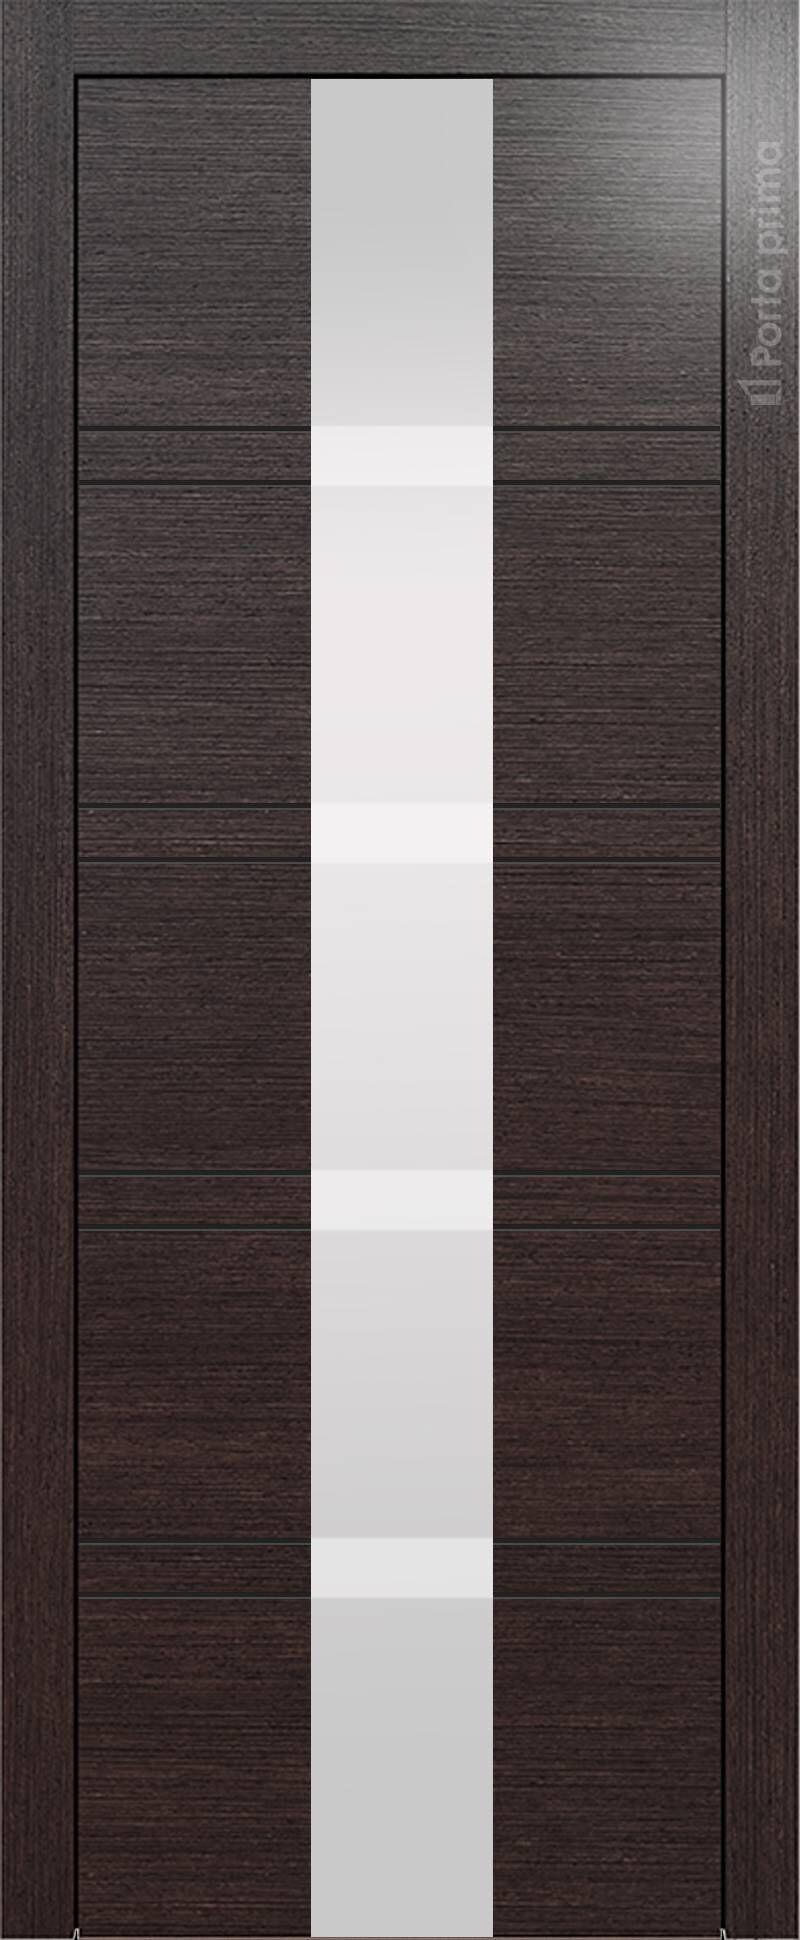 Tivoli Ж-4 цвет - Венге Шоколад Со стеклом (ДО)